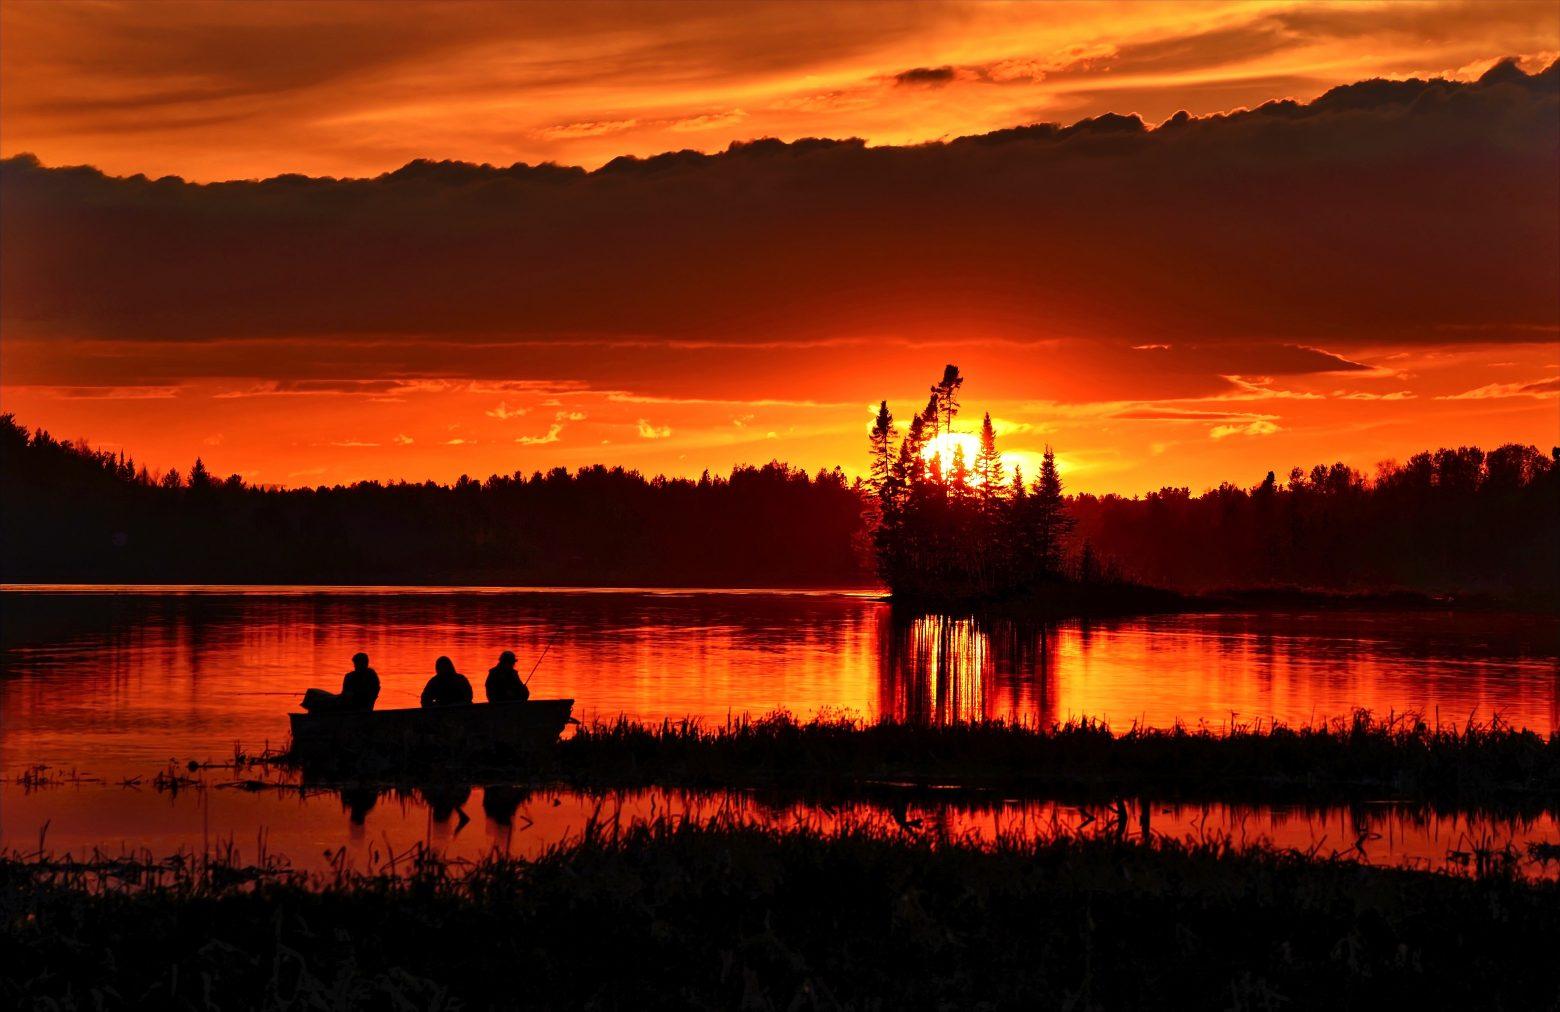 sunset-1421010